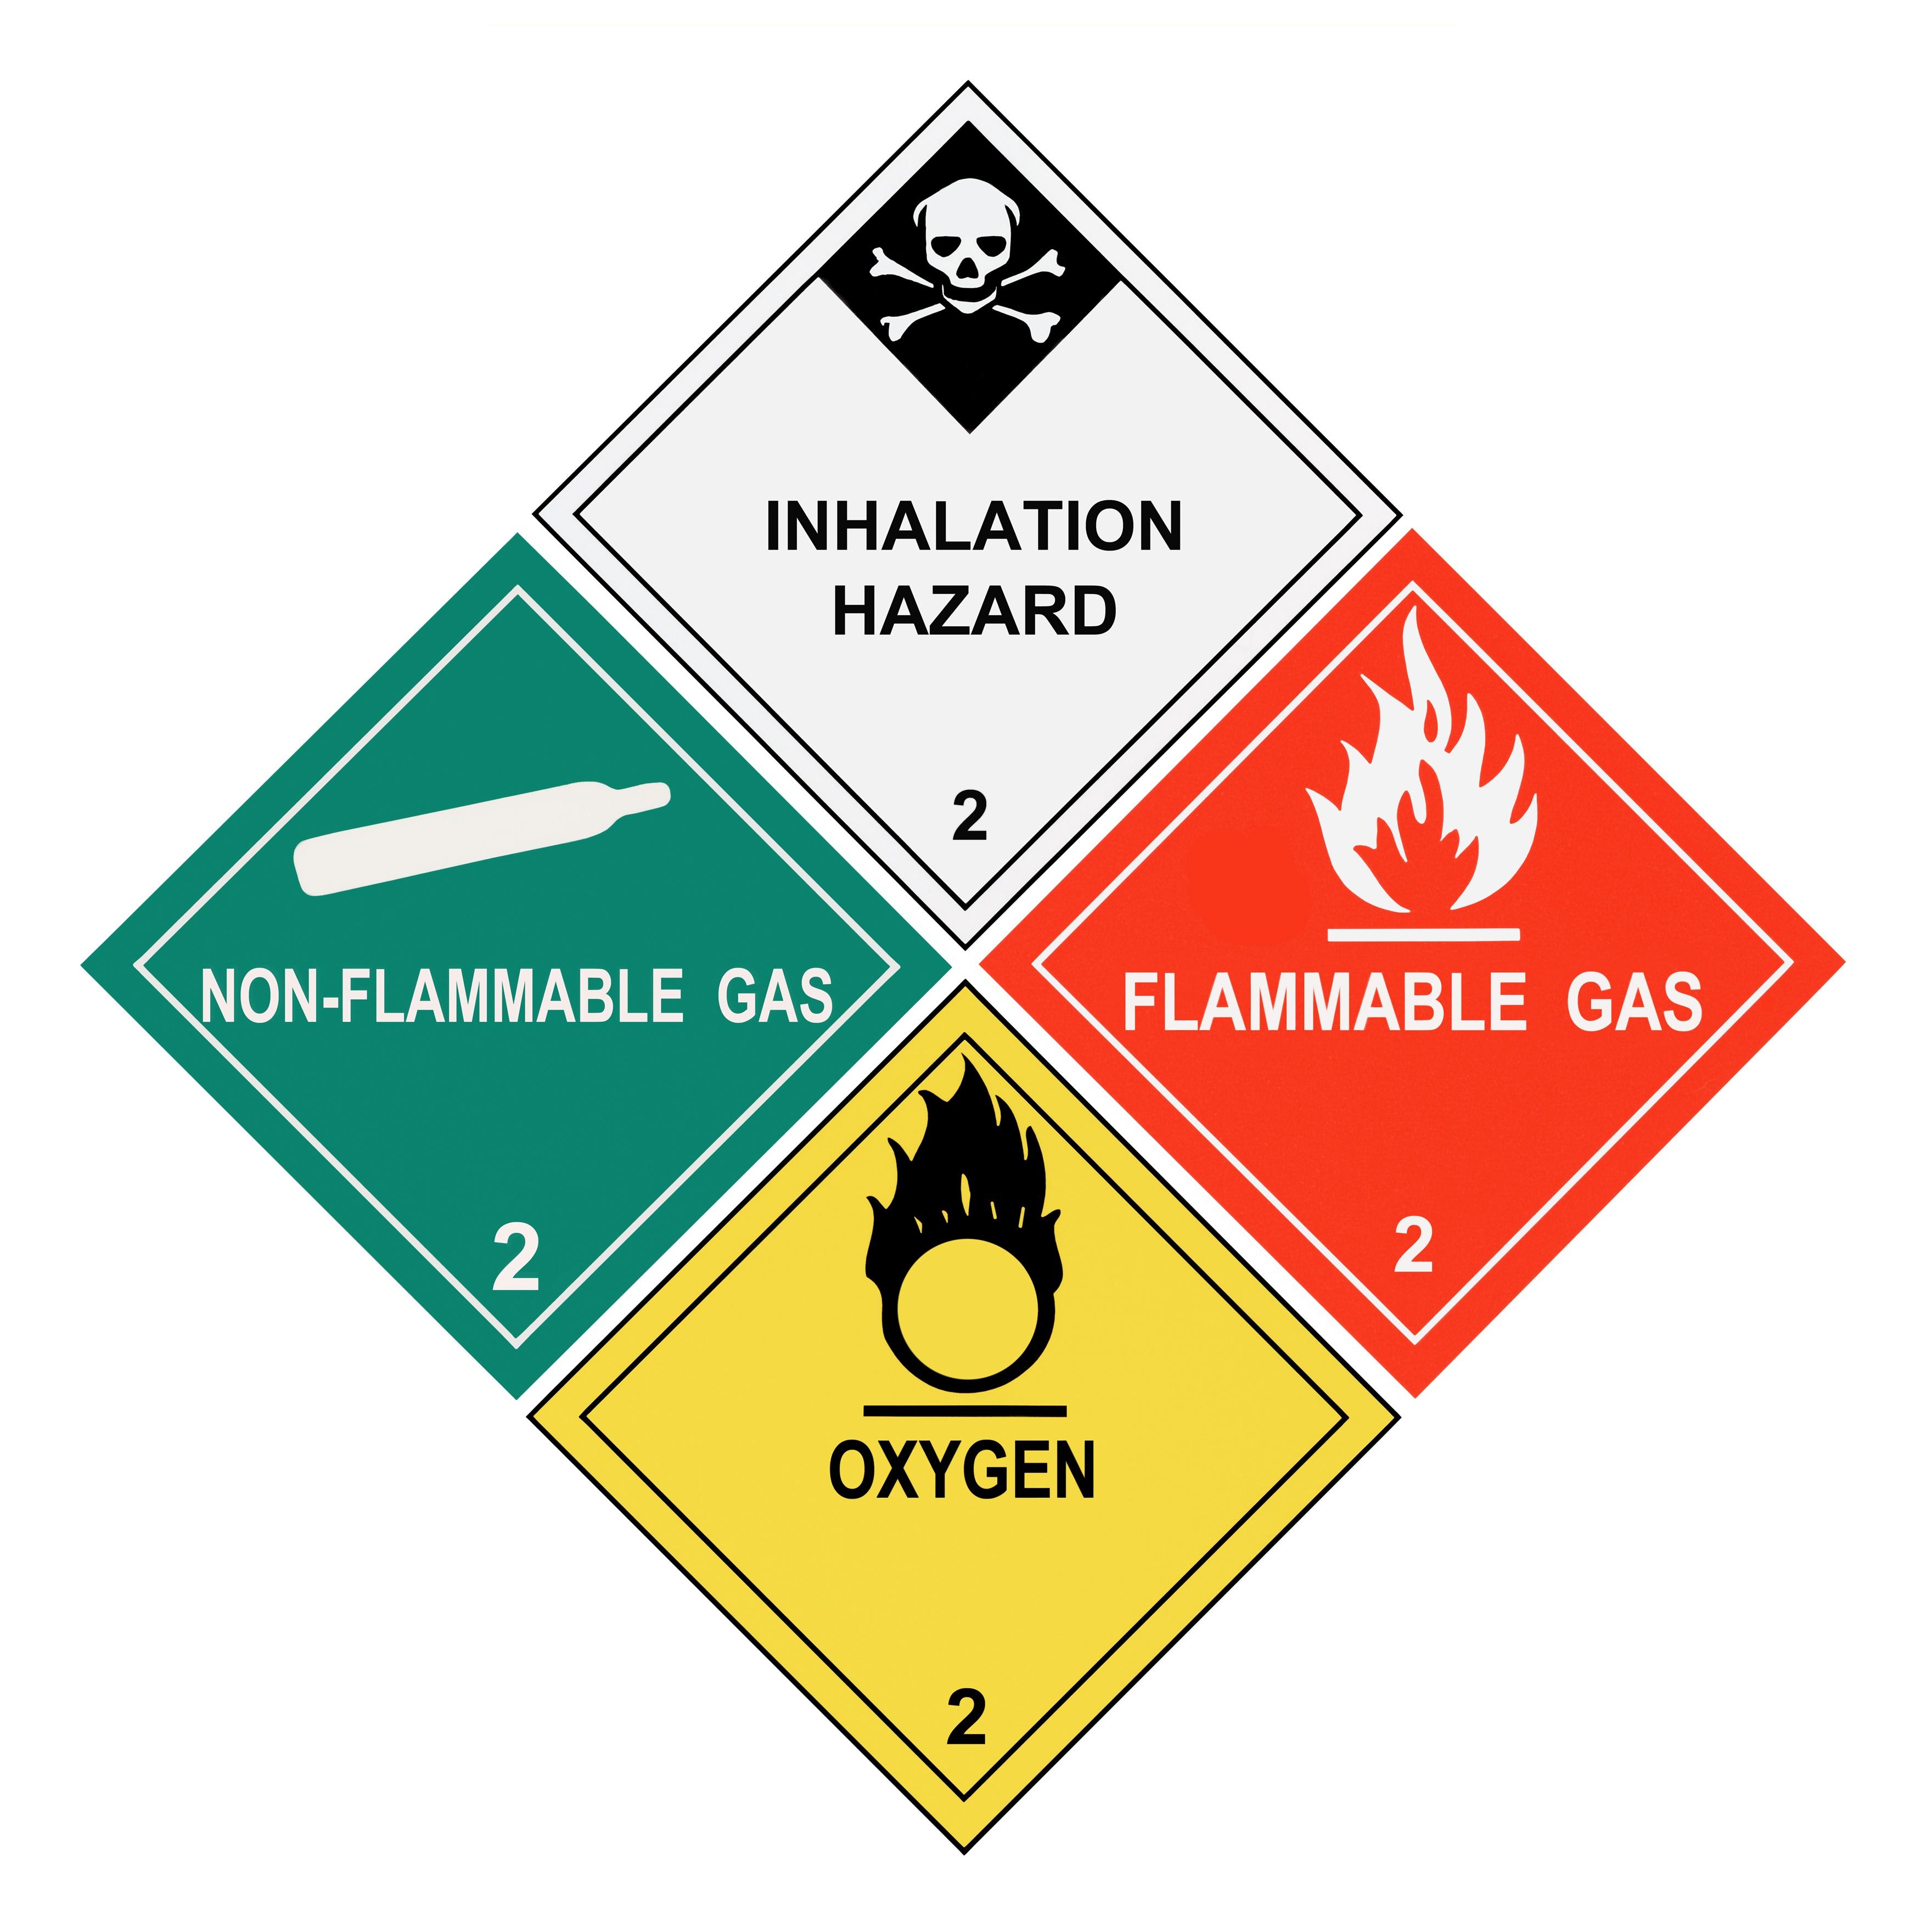 Iata Publishes Addendum 57th Edition Dangerous Goods Regulations Dgr